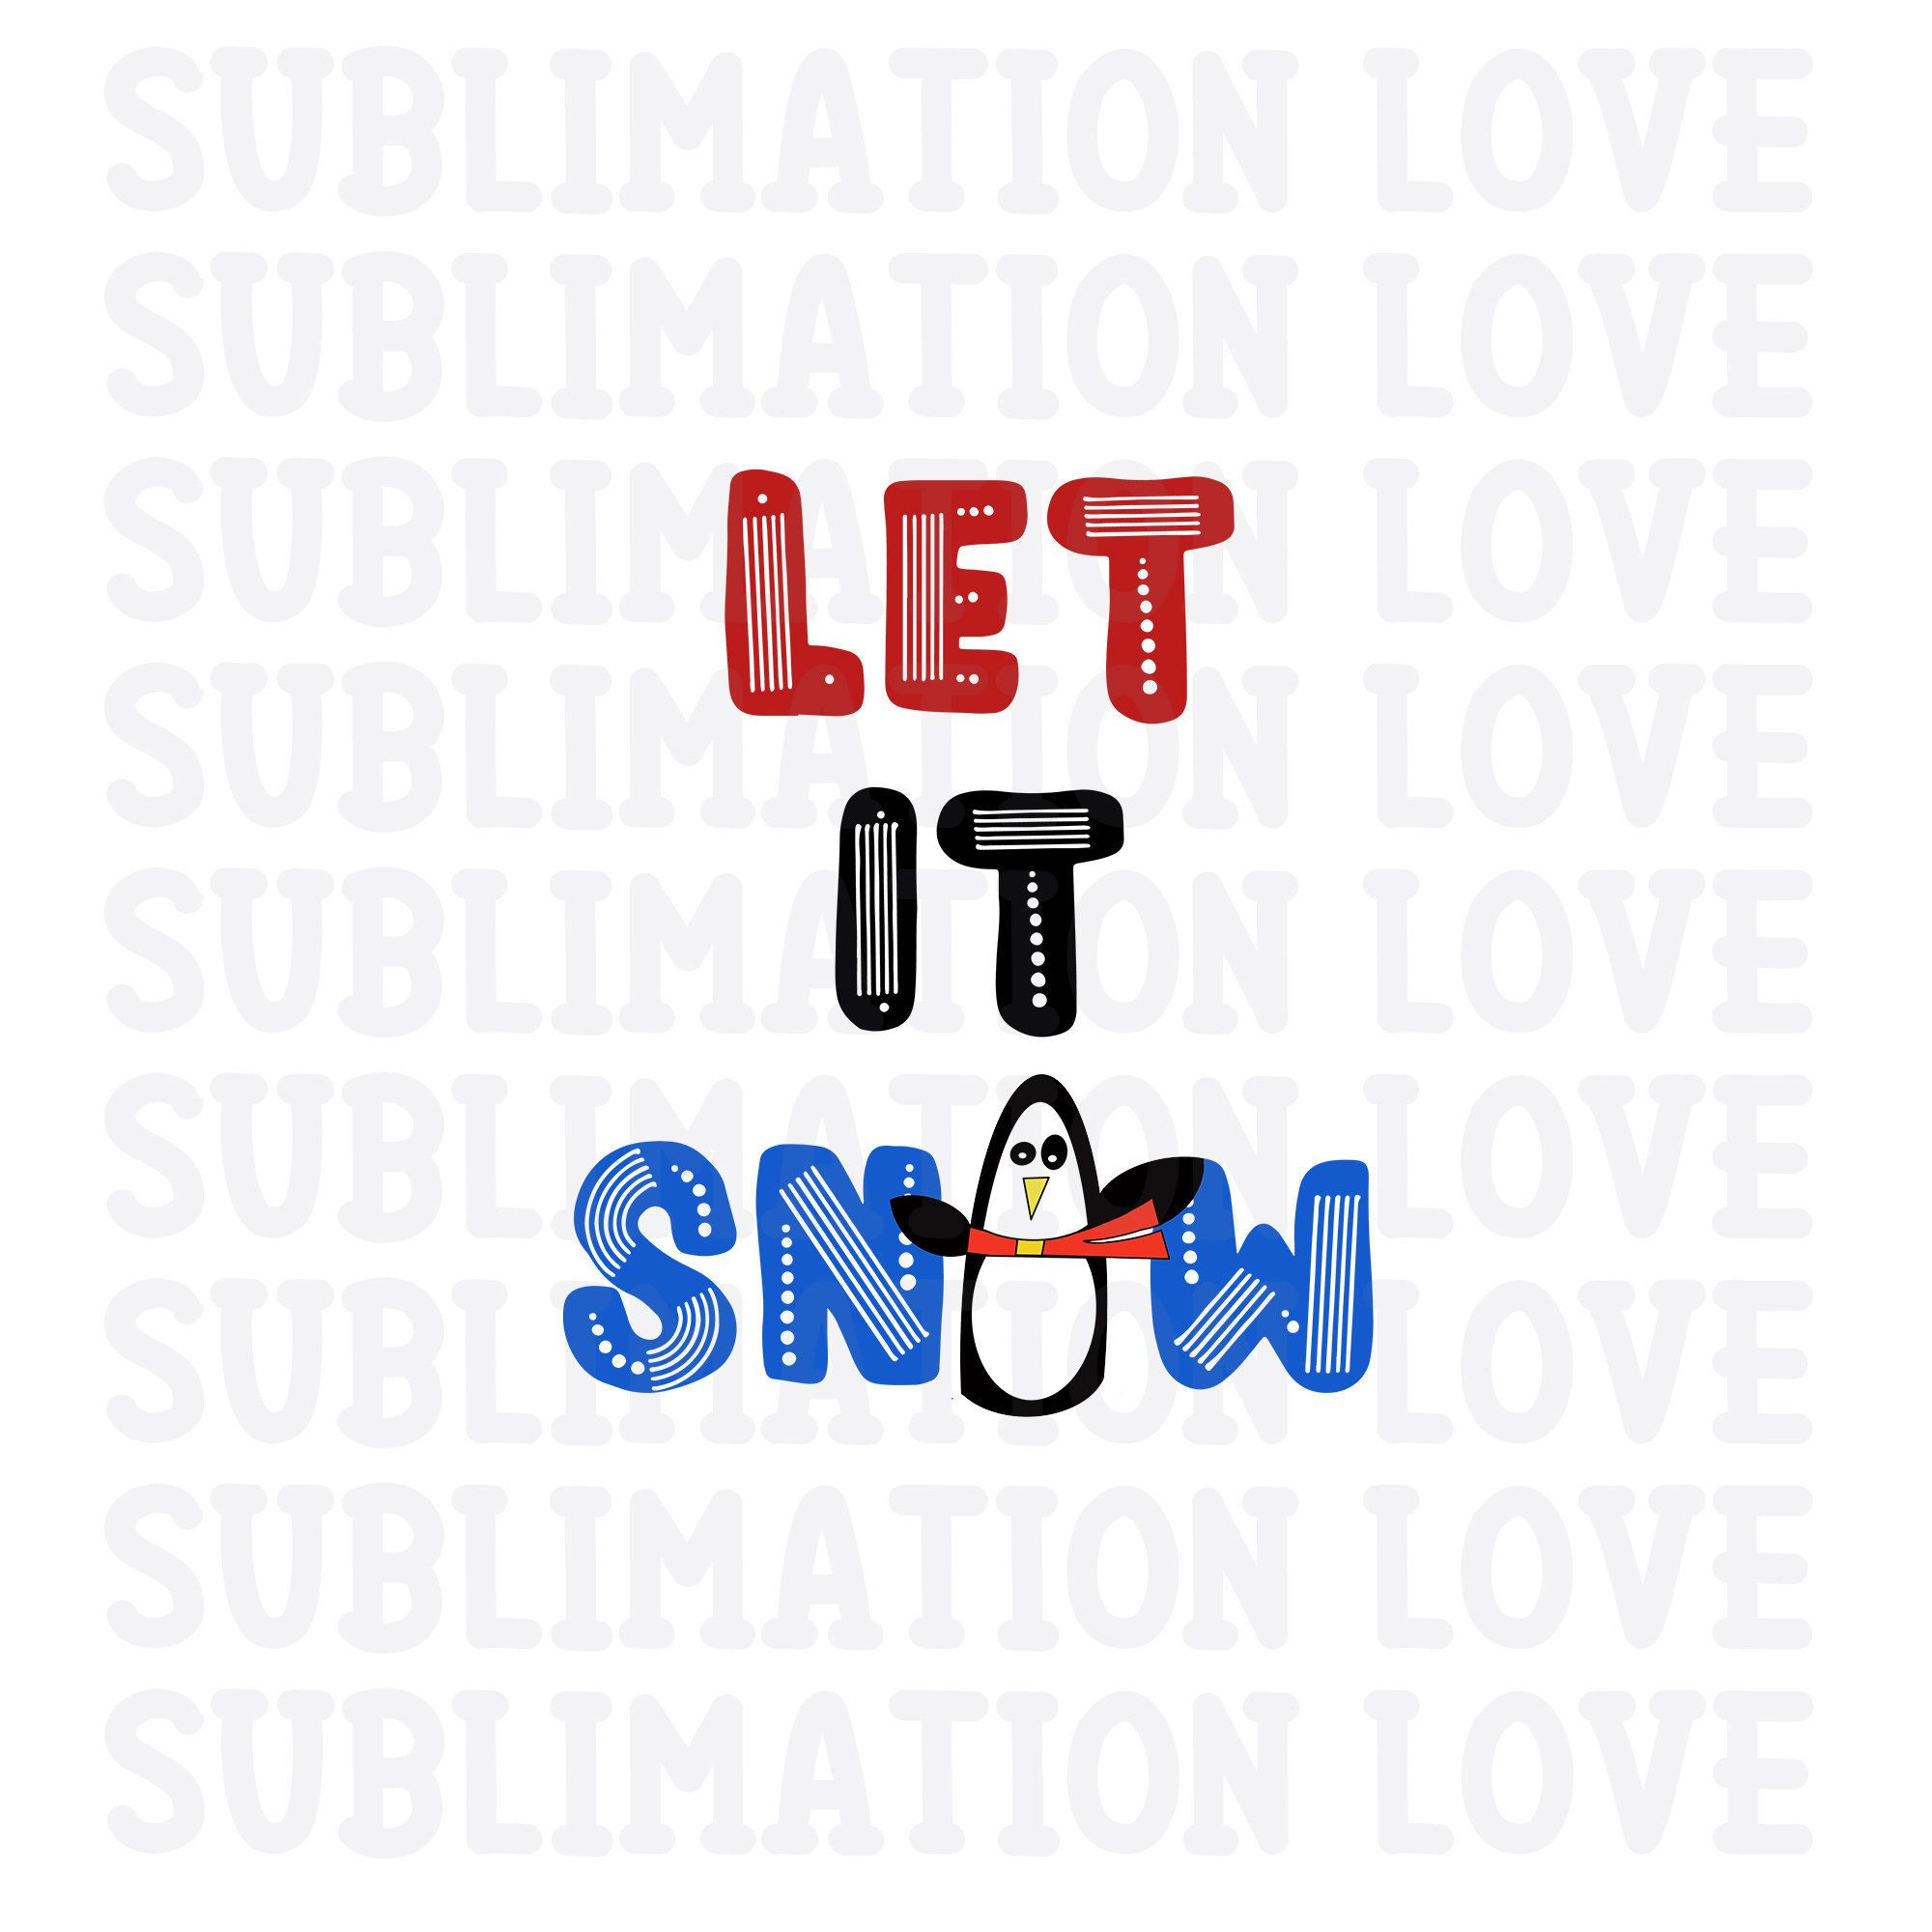 Penguin Let It Snow Png Winter Sublimation Designs Downloads Etsy Printable Artwork How To Draw Hands Clip Art